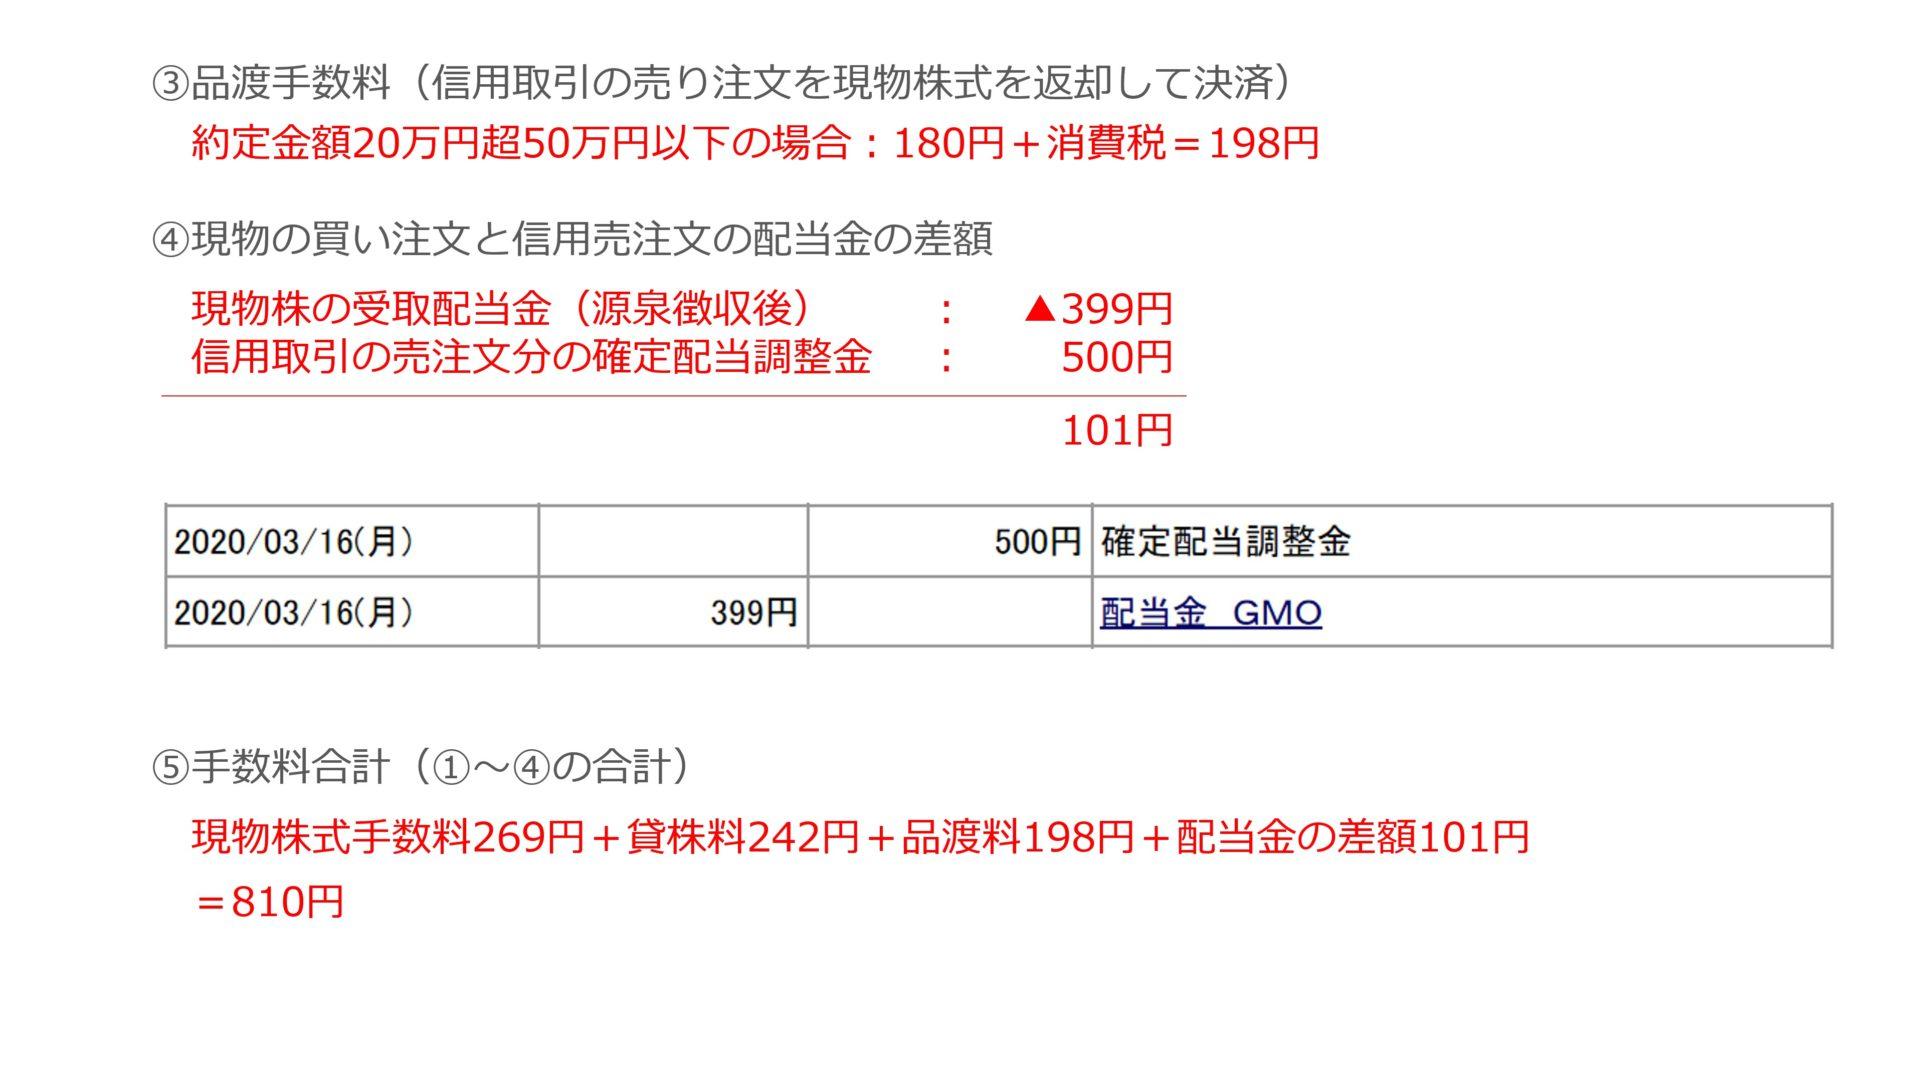 GMOインターネット 株主優待 クロス取引